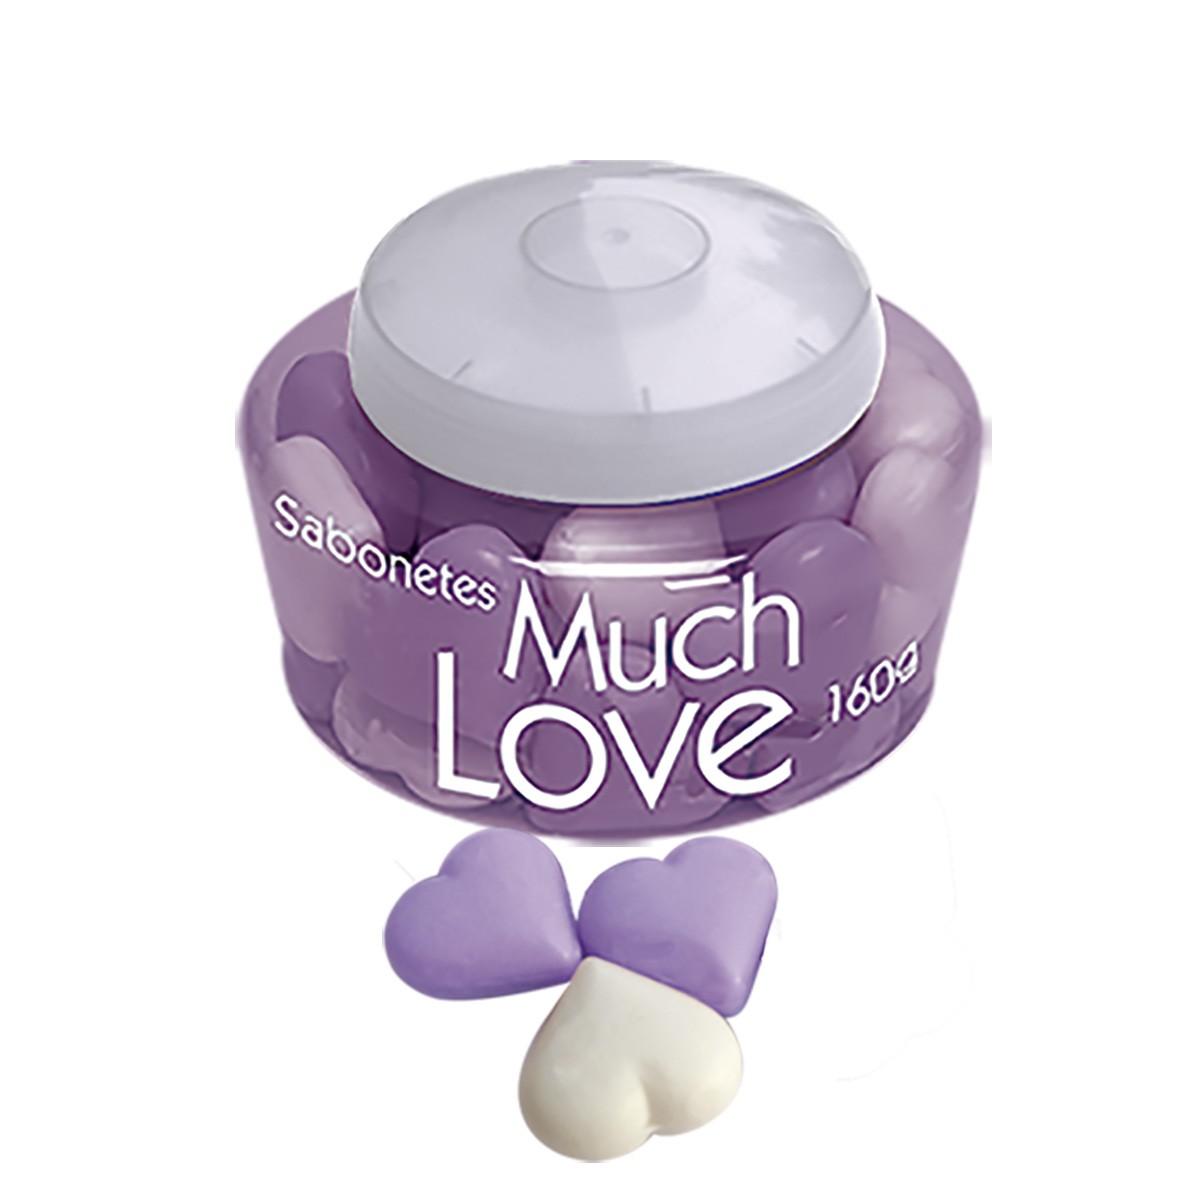 Sabonete Much Love Mini Coração Lilac 160g